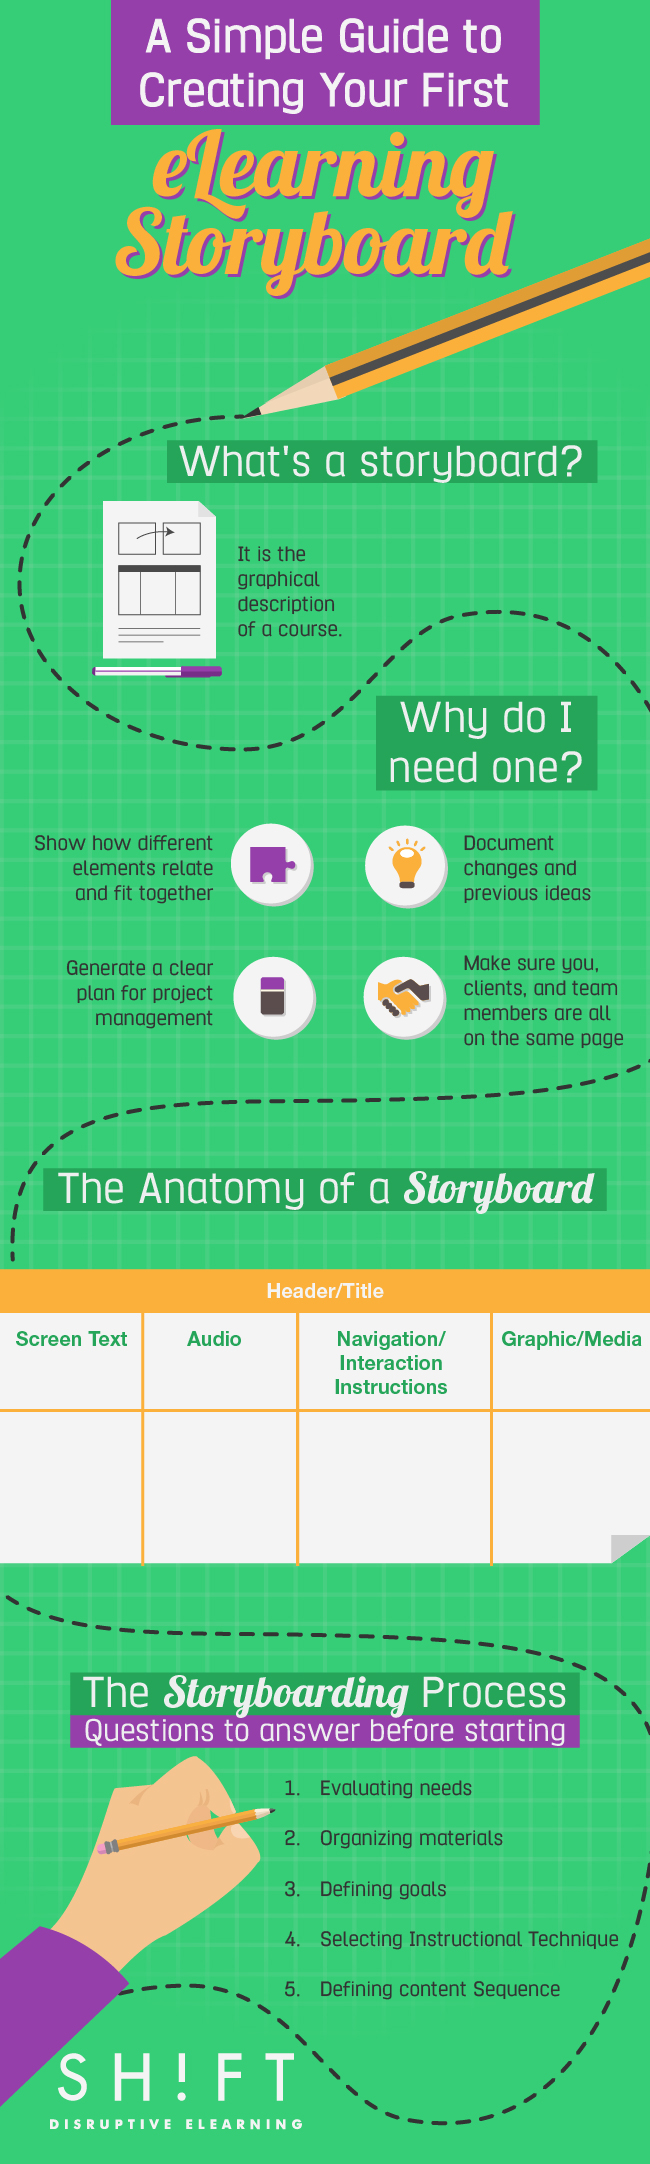 eLearning storyboard